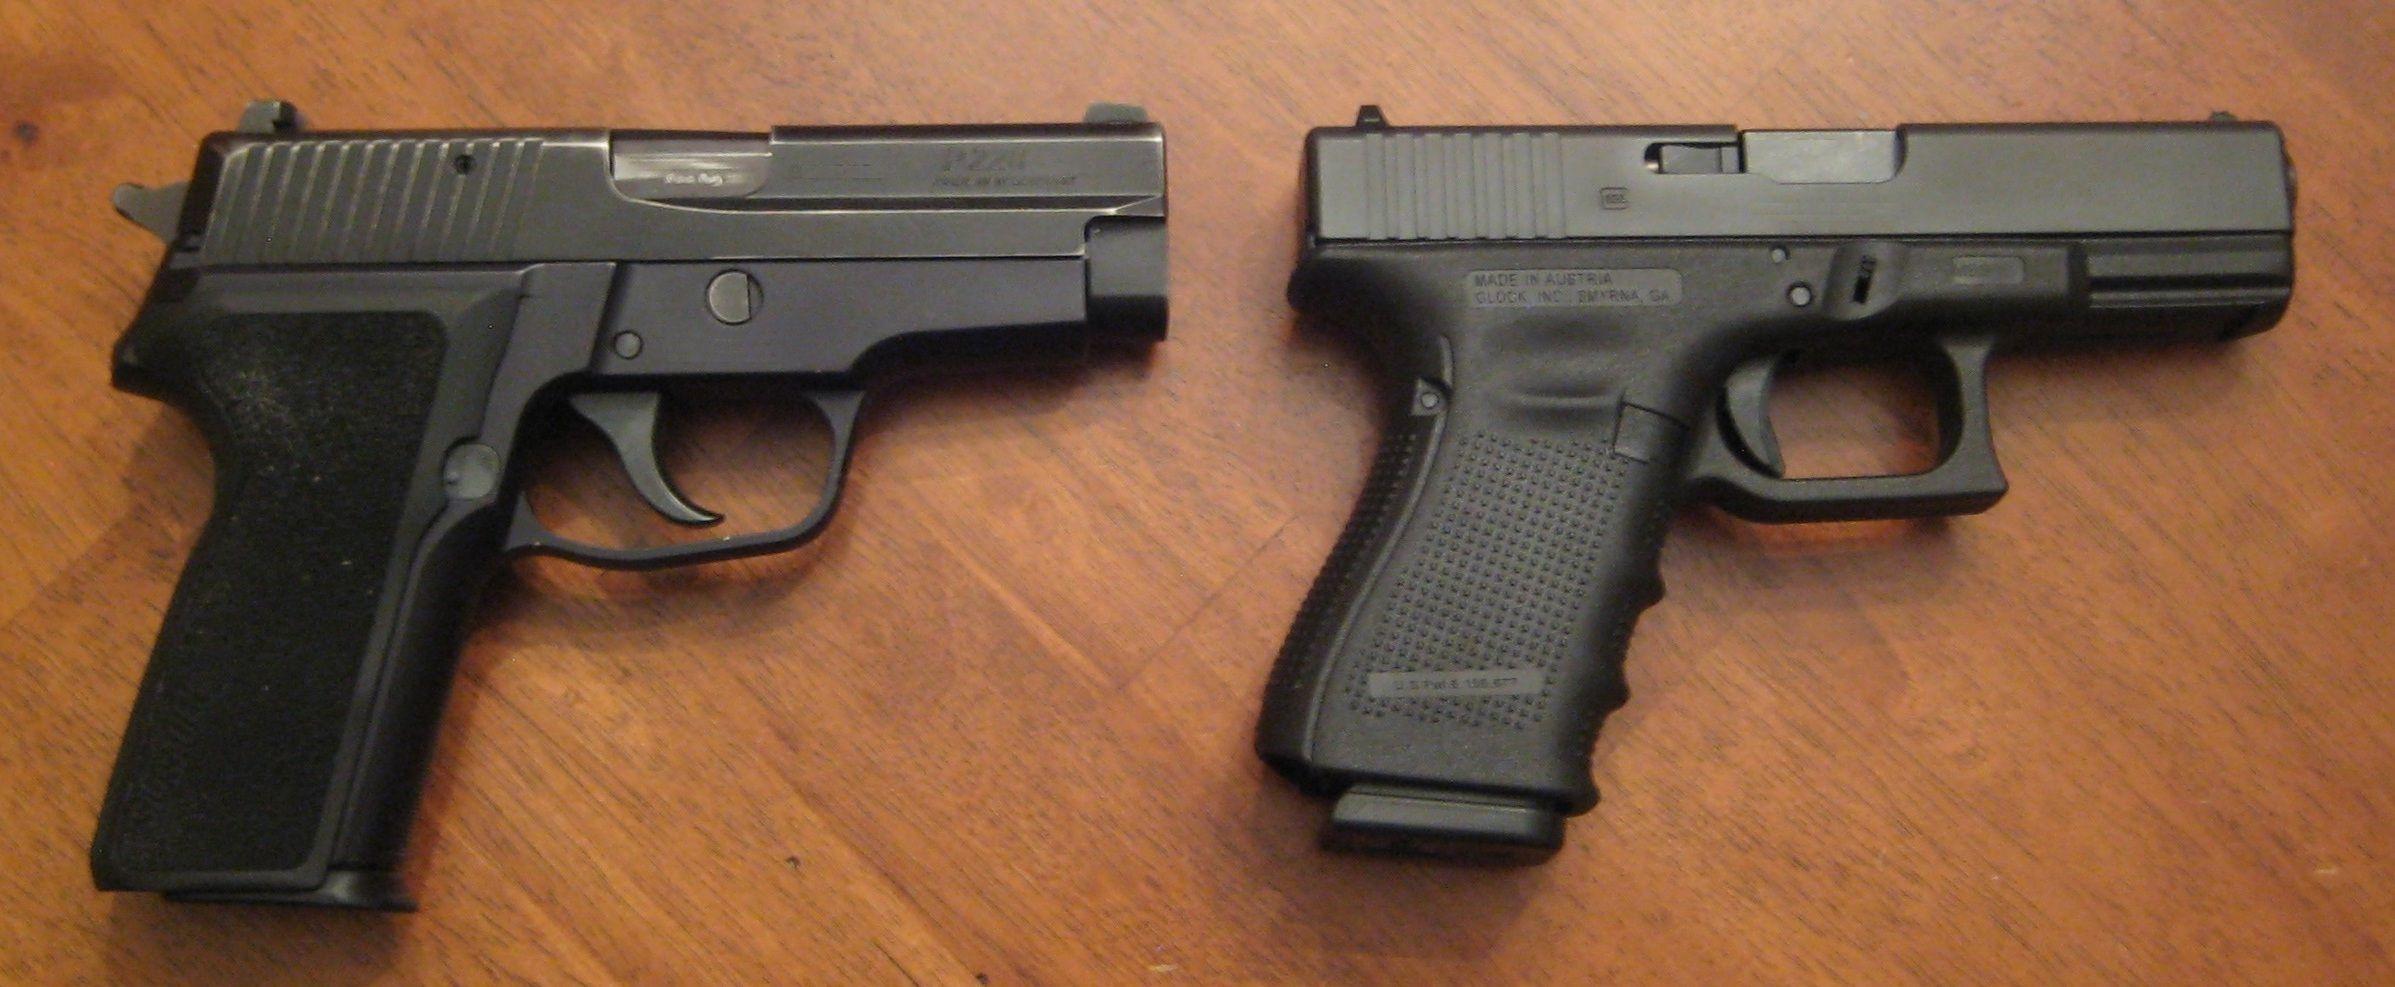 Sig Sauer P228 E2 9mm 15rd vs Glock 19 Gen 4 9mm 15rd - Two